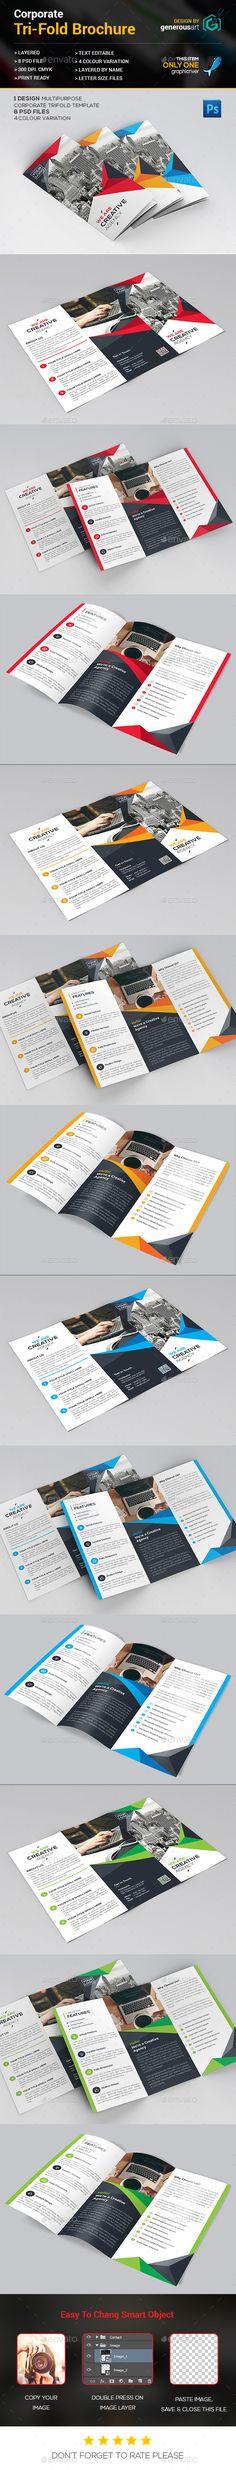 Bifold Interior Design Studio Brochure-V269 Studios, Print - studio brochure